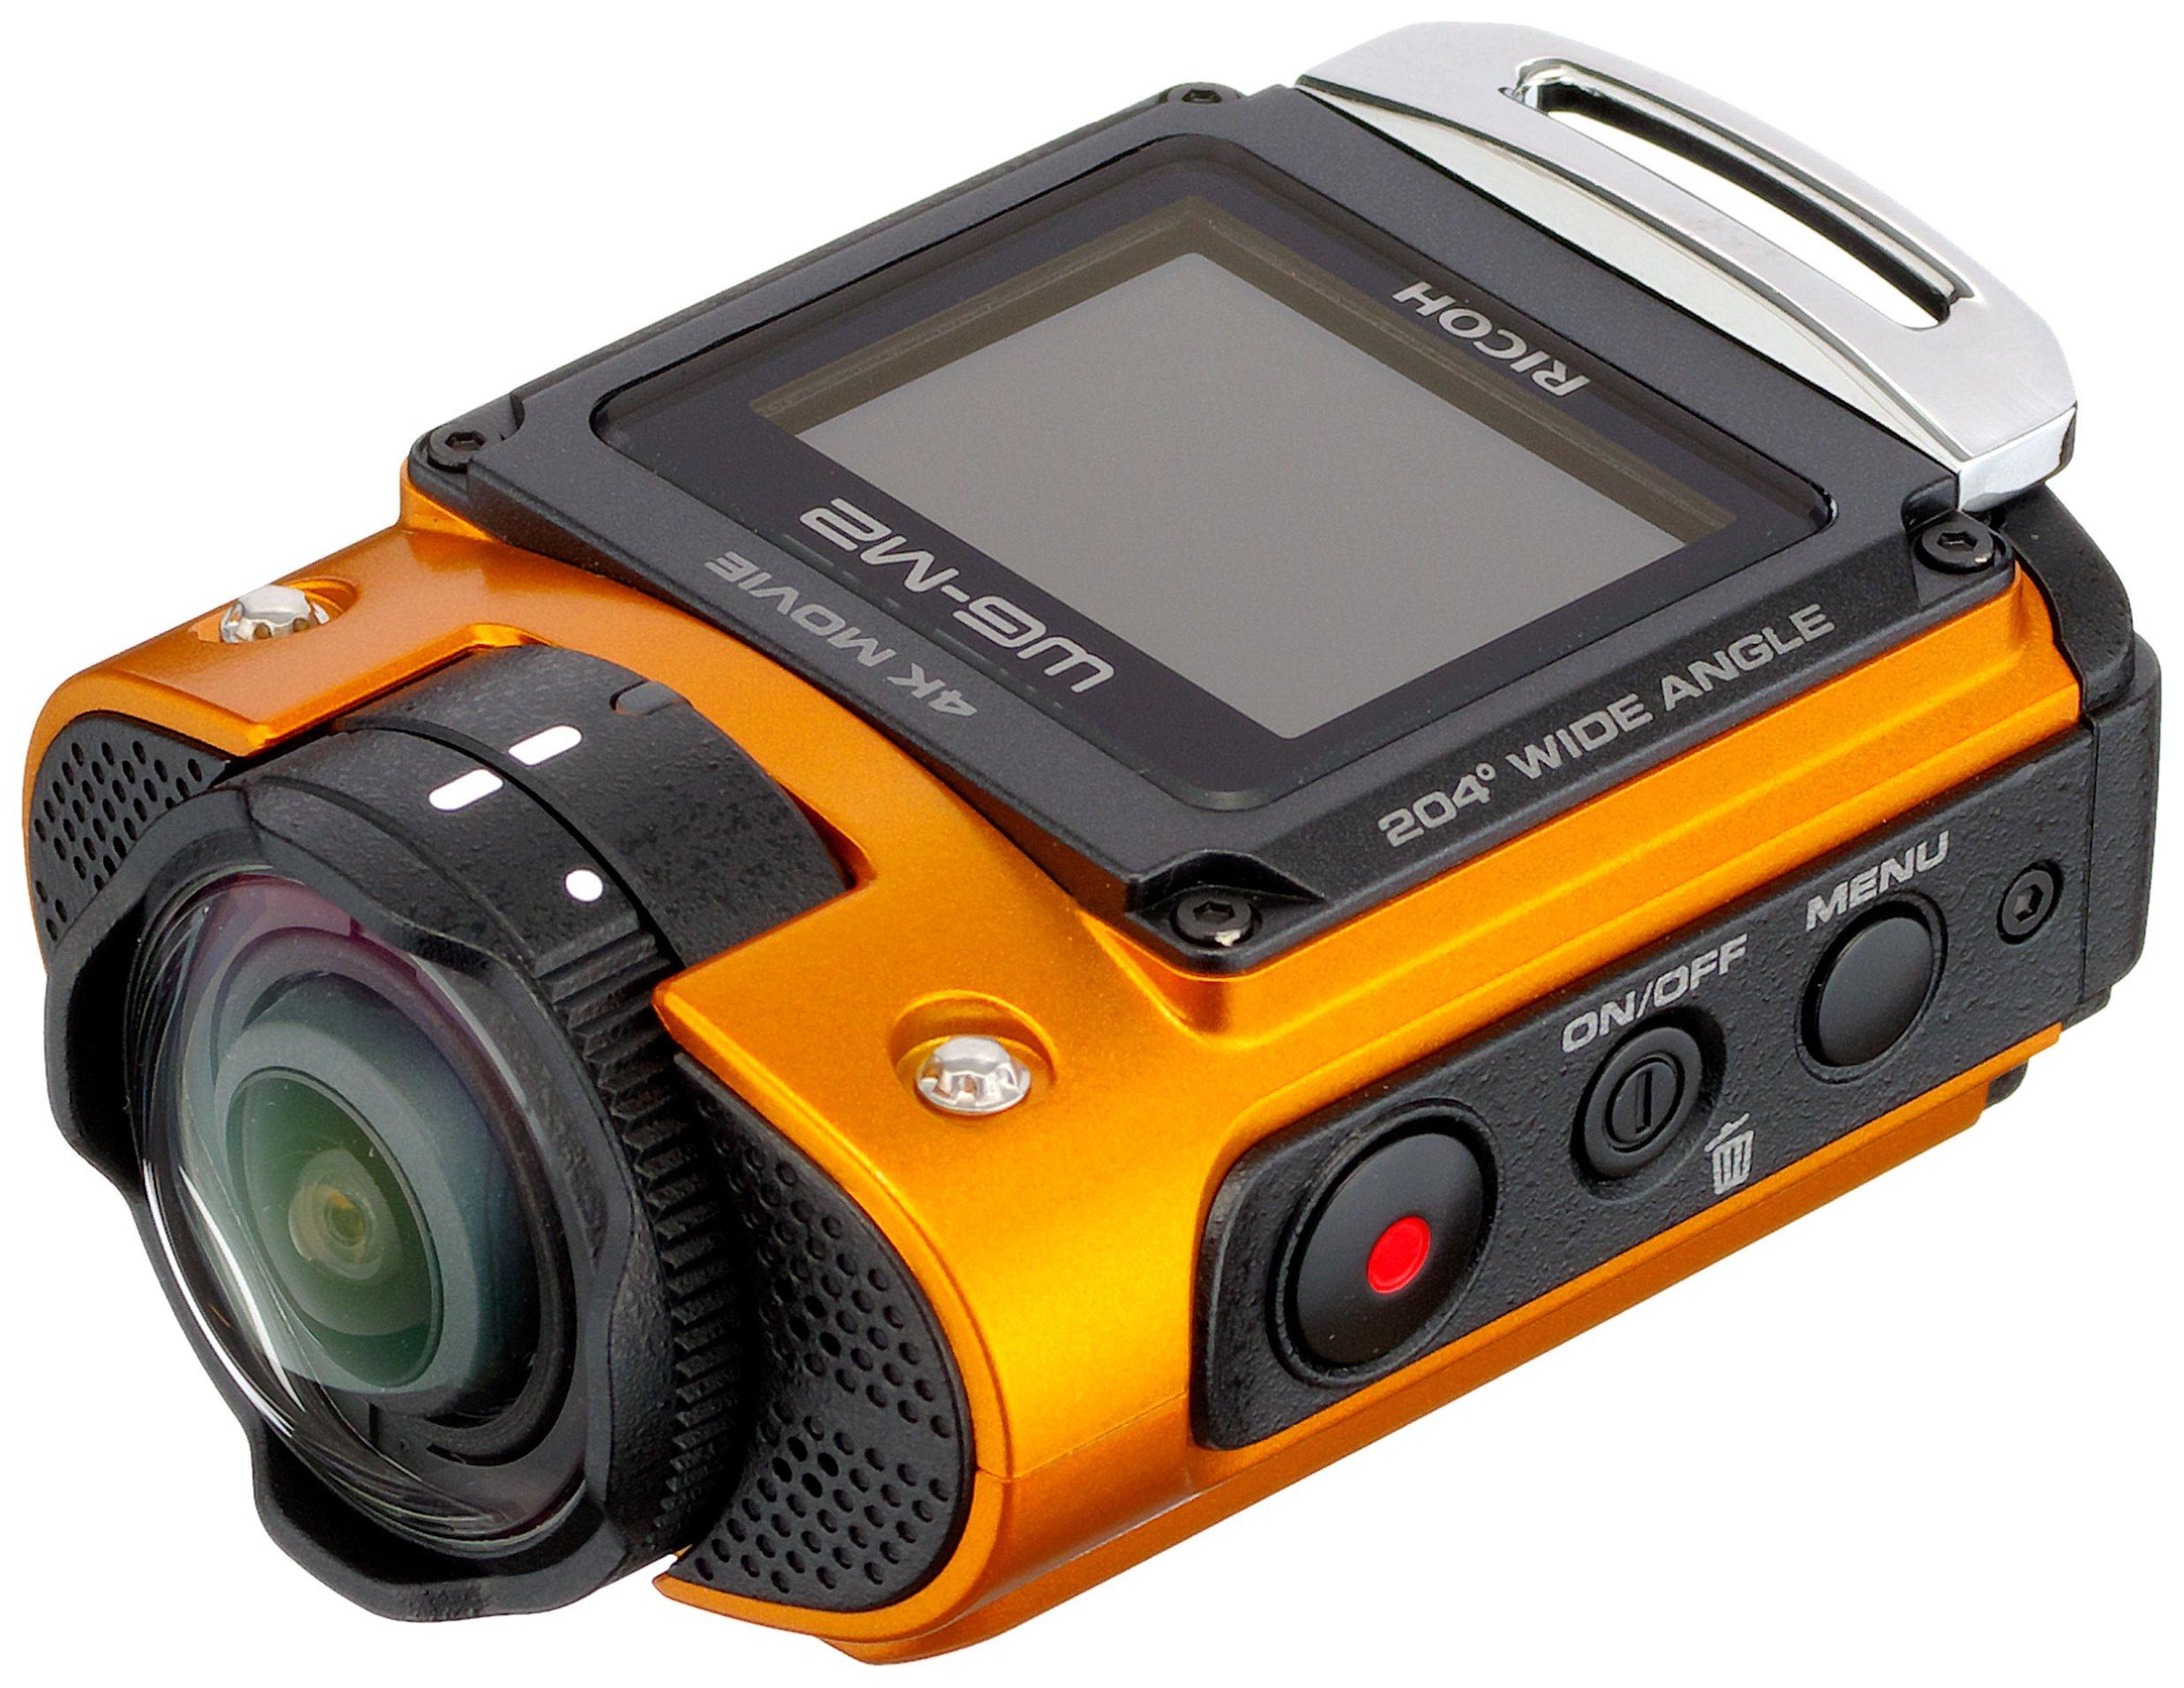 Ricoh WG-M2 Shockproof Waterproof Action Cam